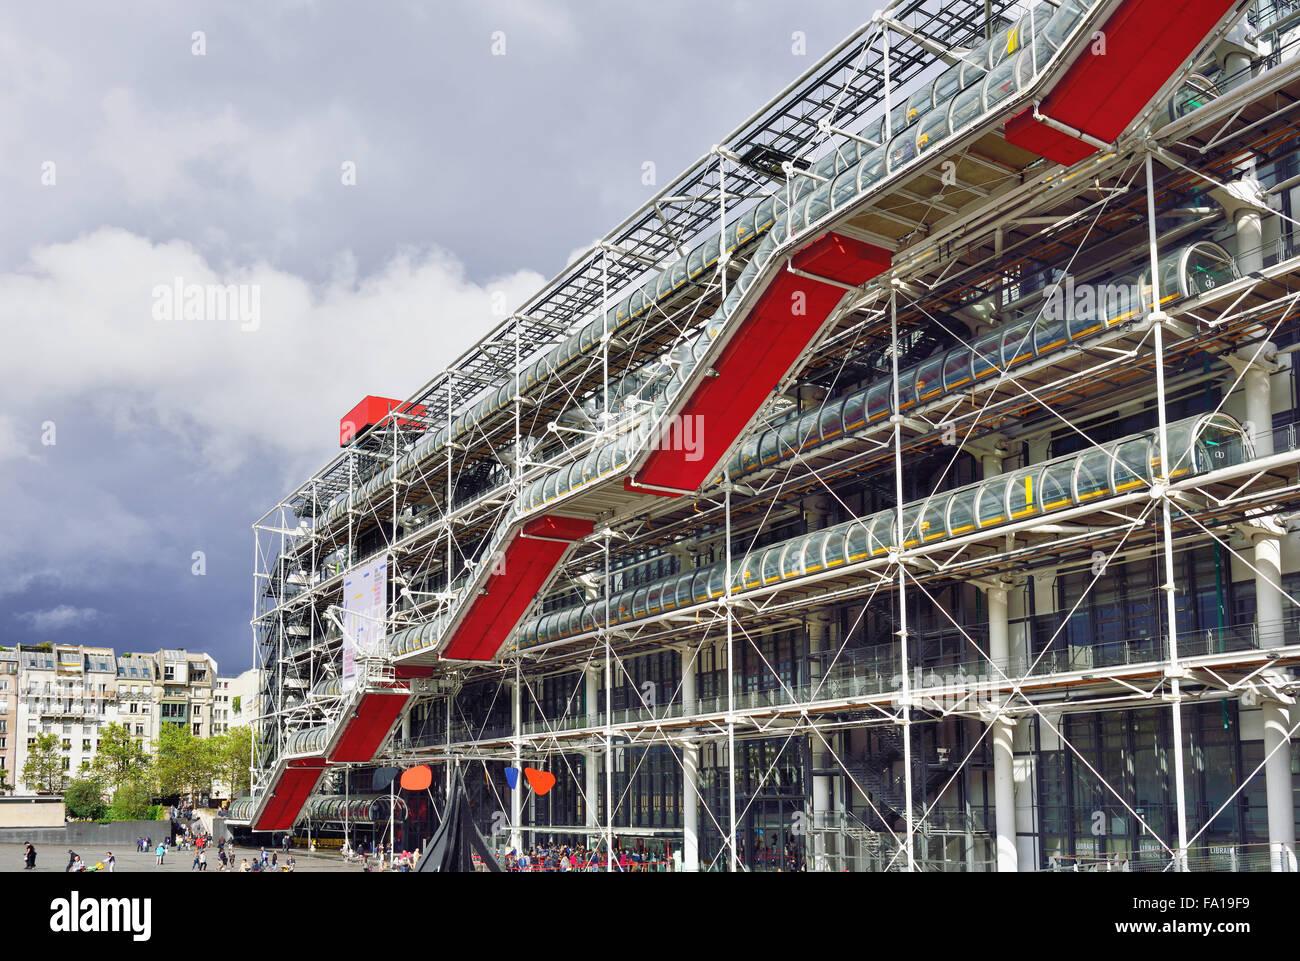 Covered outdoor staircase, Museum of Modern Art, Centre Pompidou, Marais, Paris, Ile De Fance, France - Stock Image